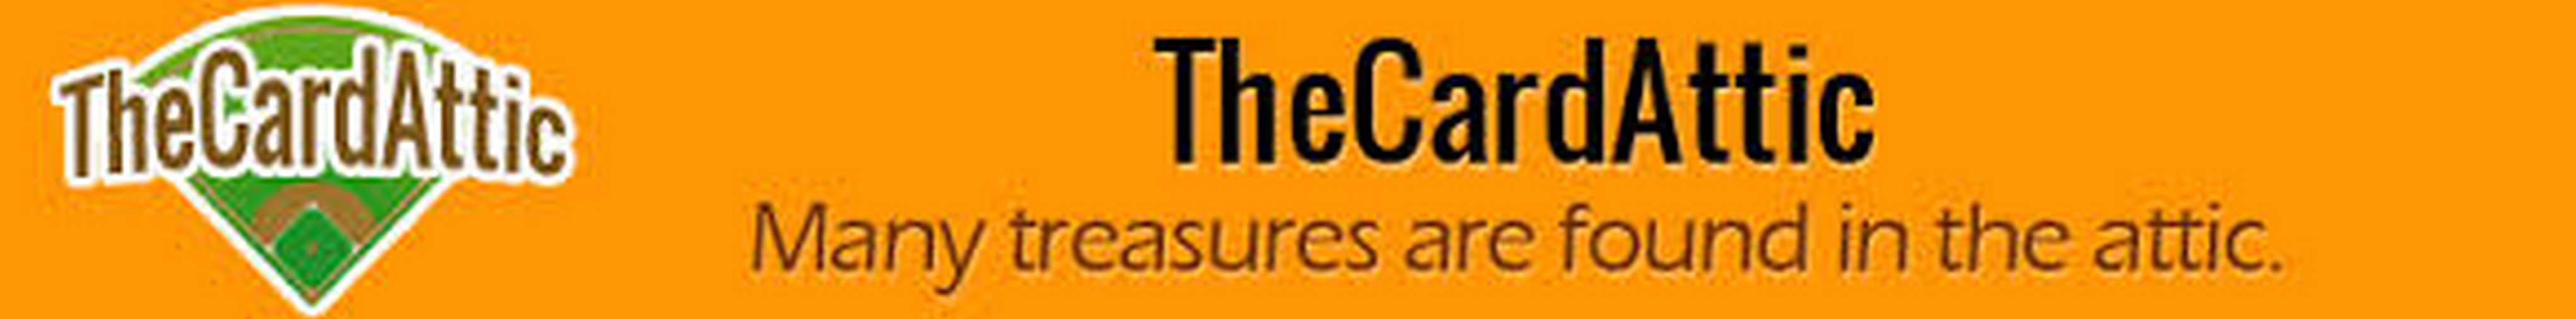 Thecardattic